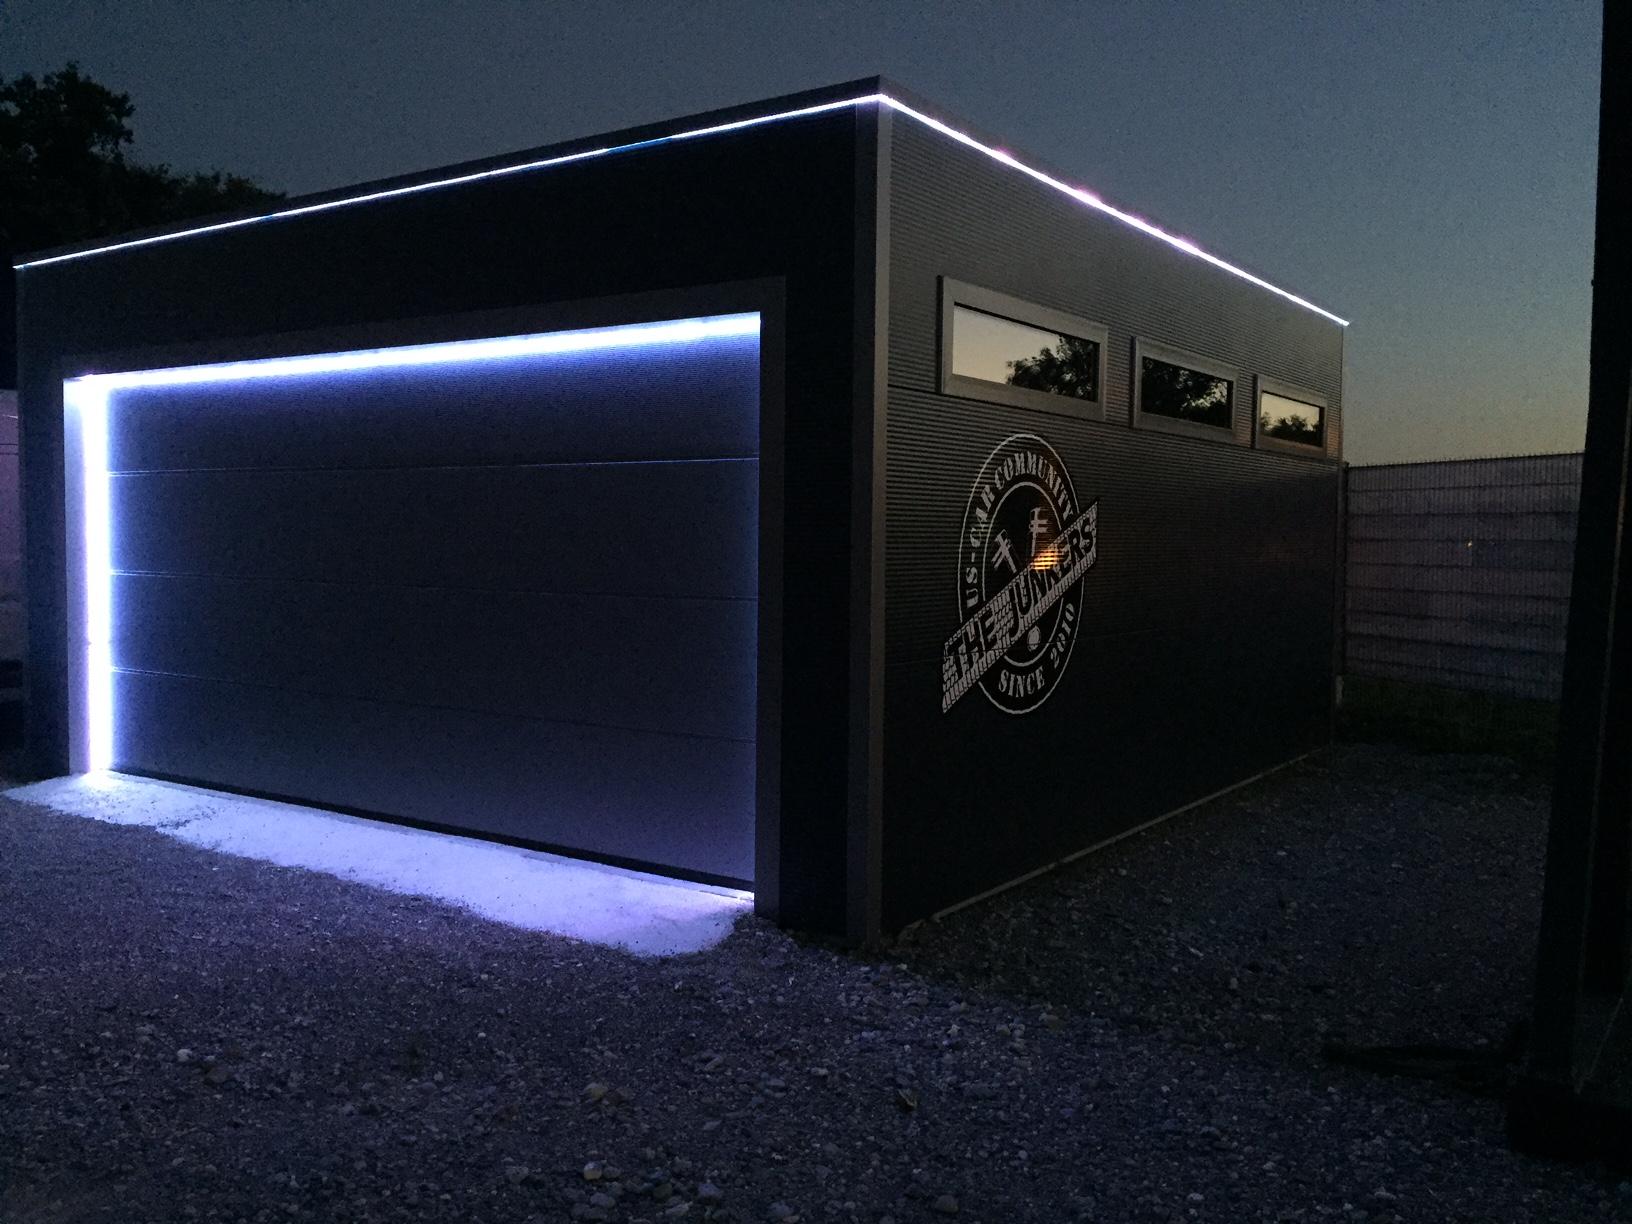 traub cubus system. Black Bedroom Furniture Sets. Home Design Ideas